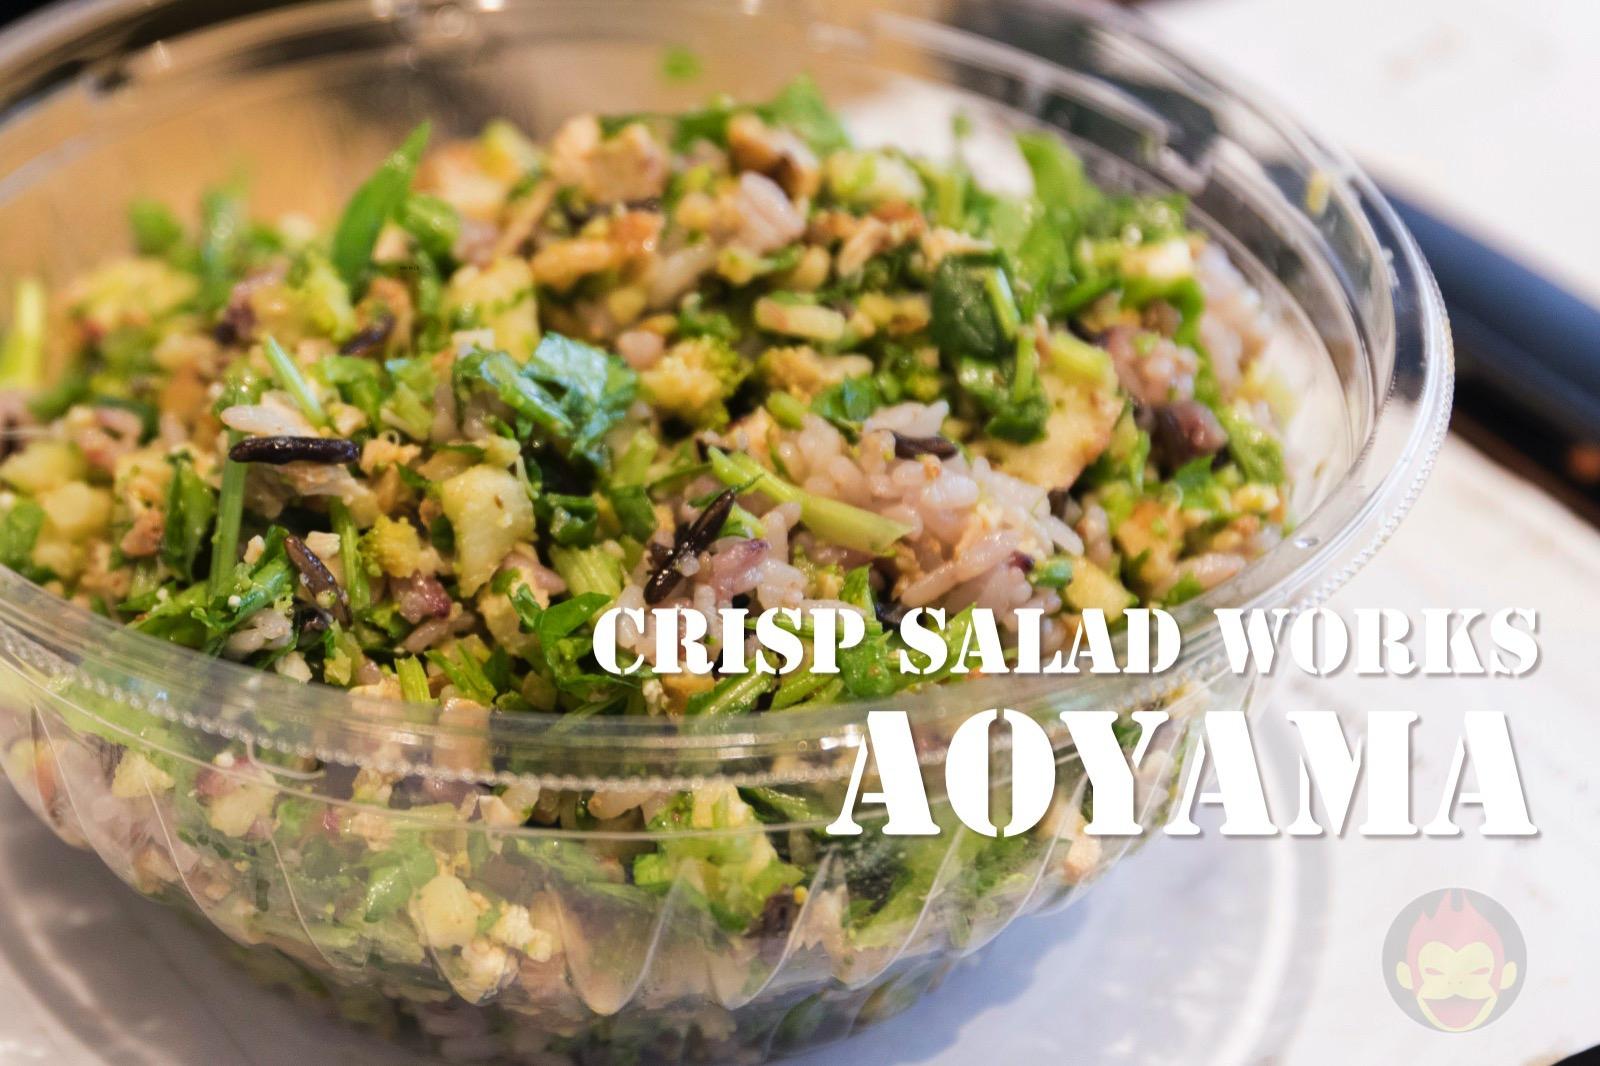 Crips-Salad-Works-Aoyama.jpg